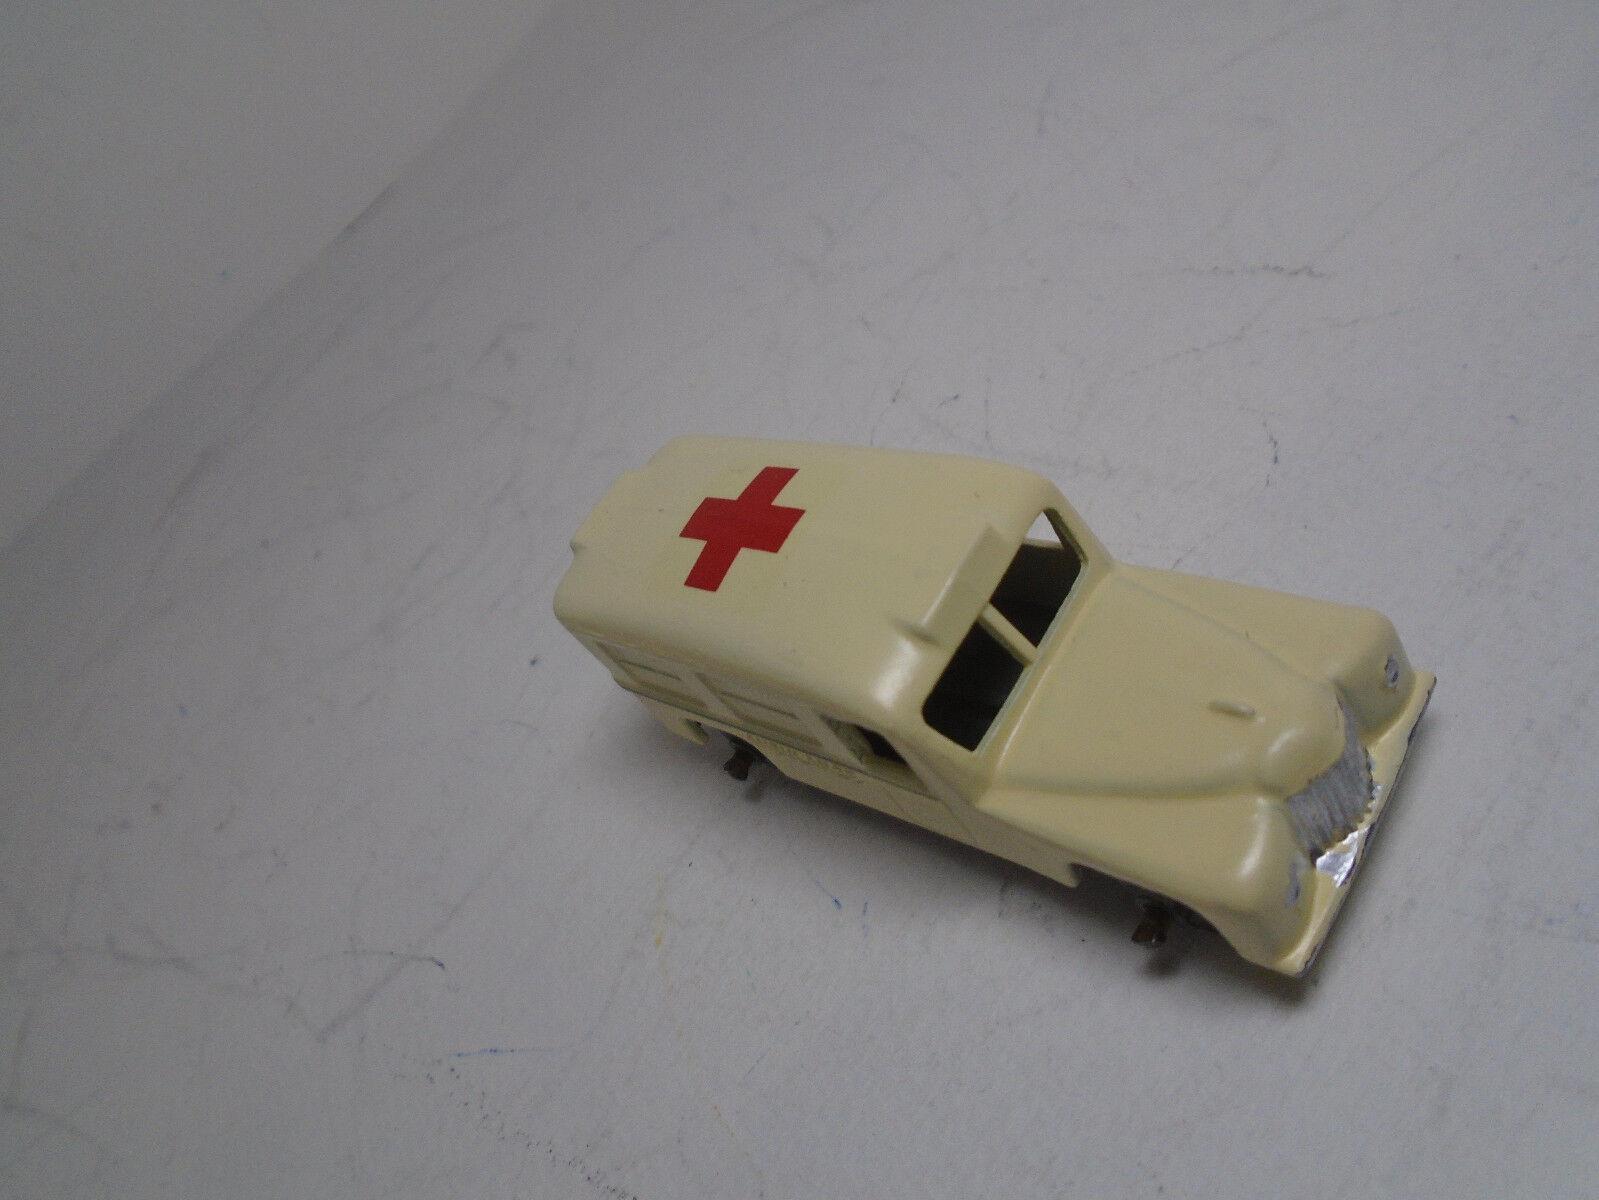 Vintage Moko Lesnety Matchbox 14A V-1 Daimler Daimler Daimler Ambulance W CROSS GMW RESTORED b00a80